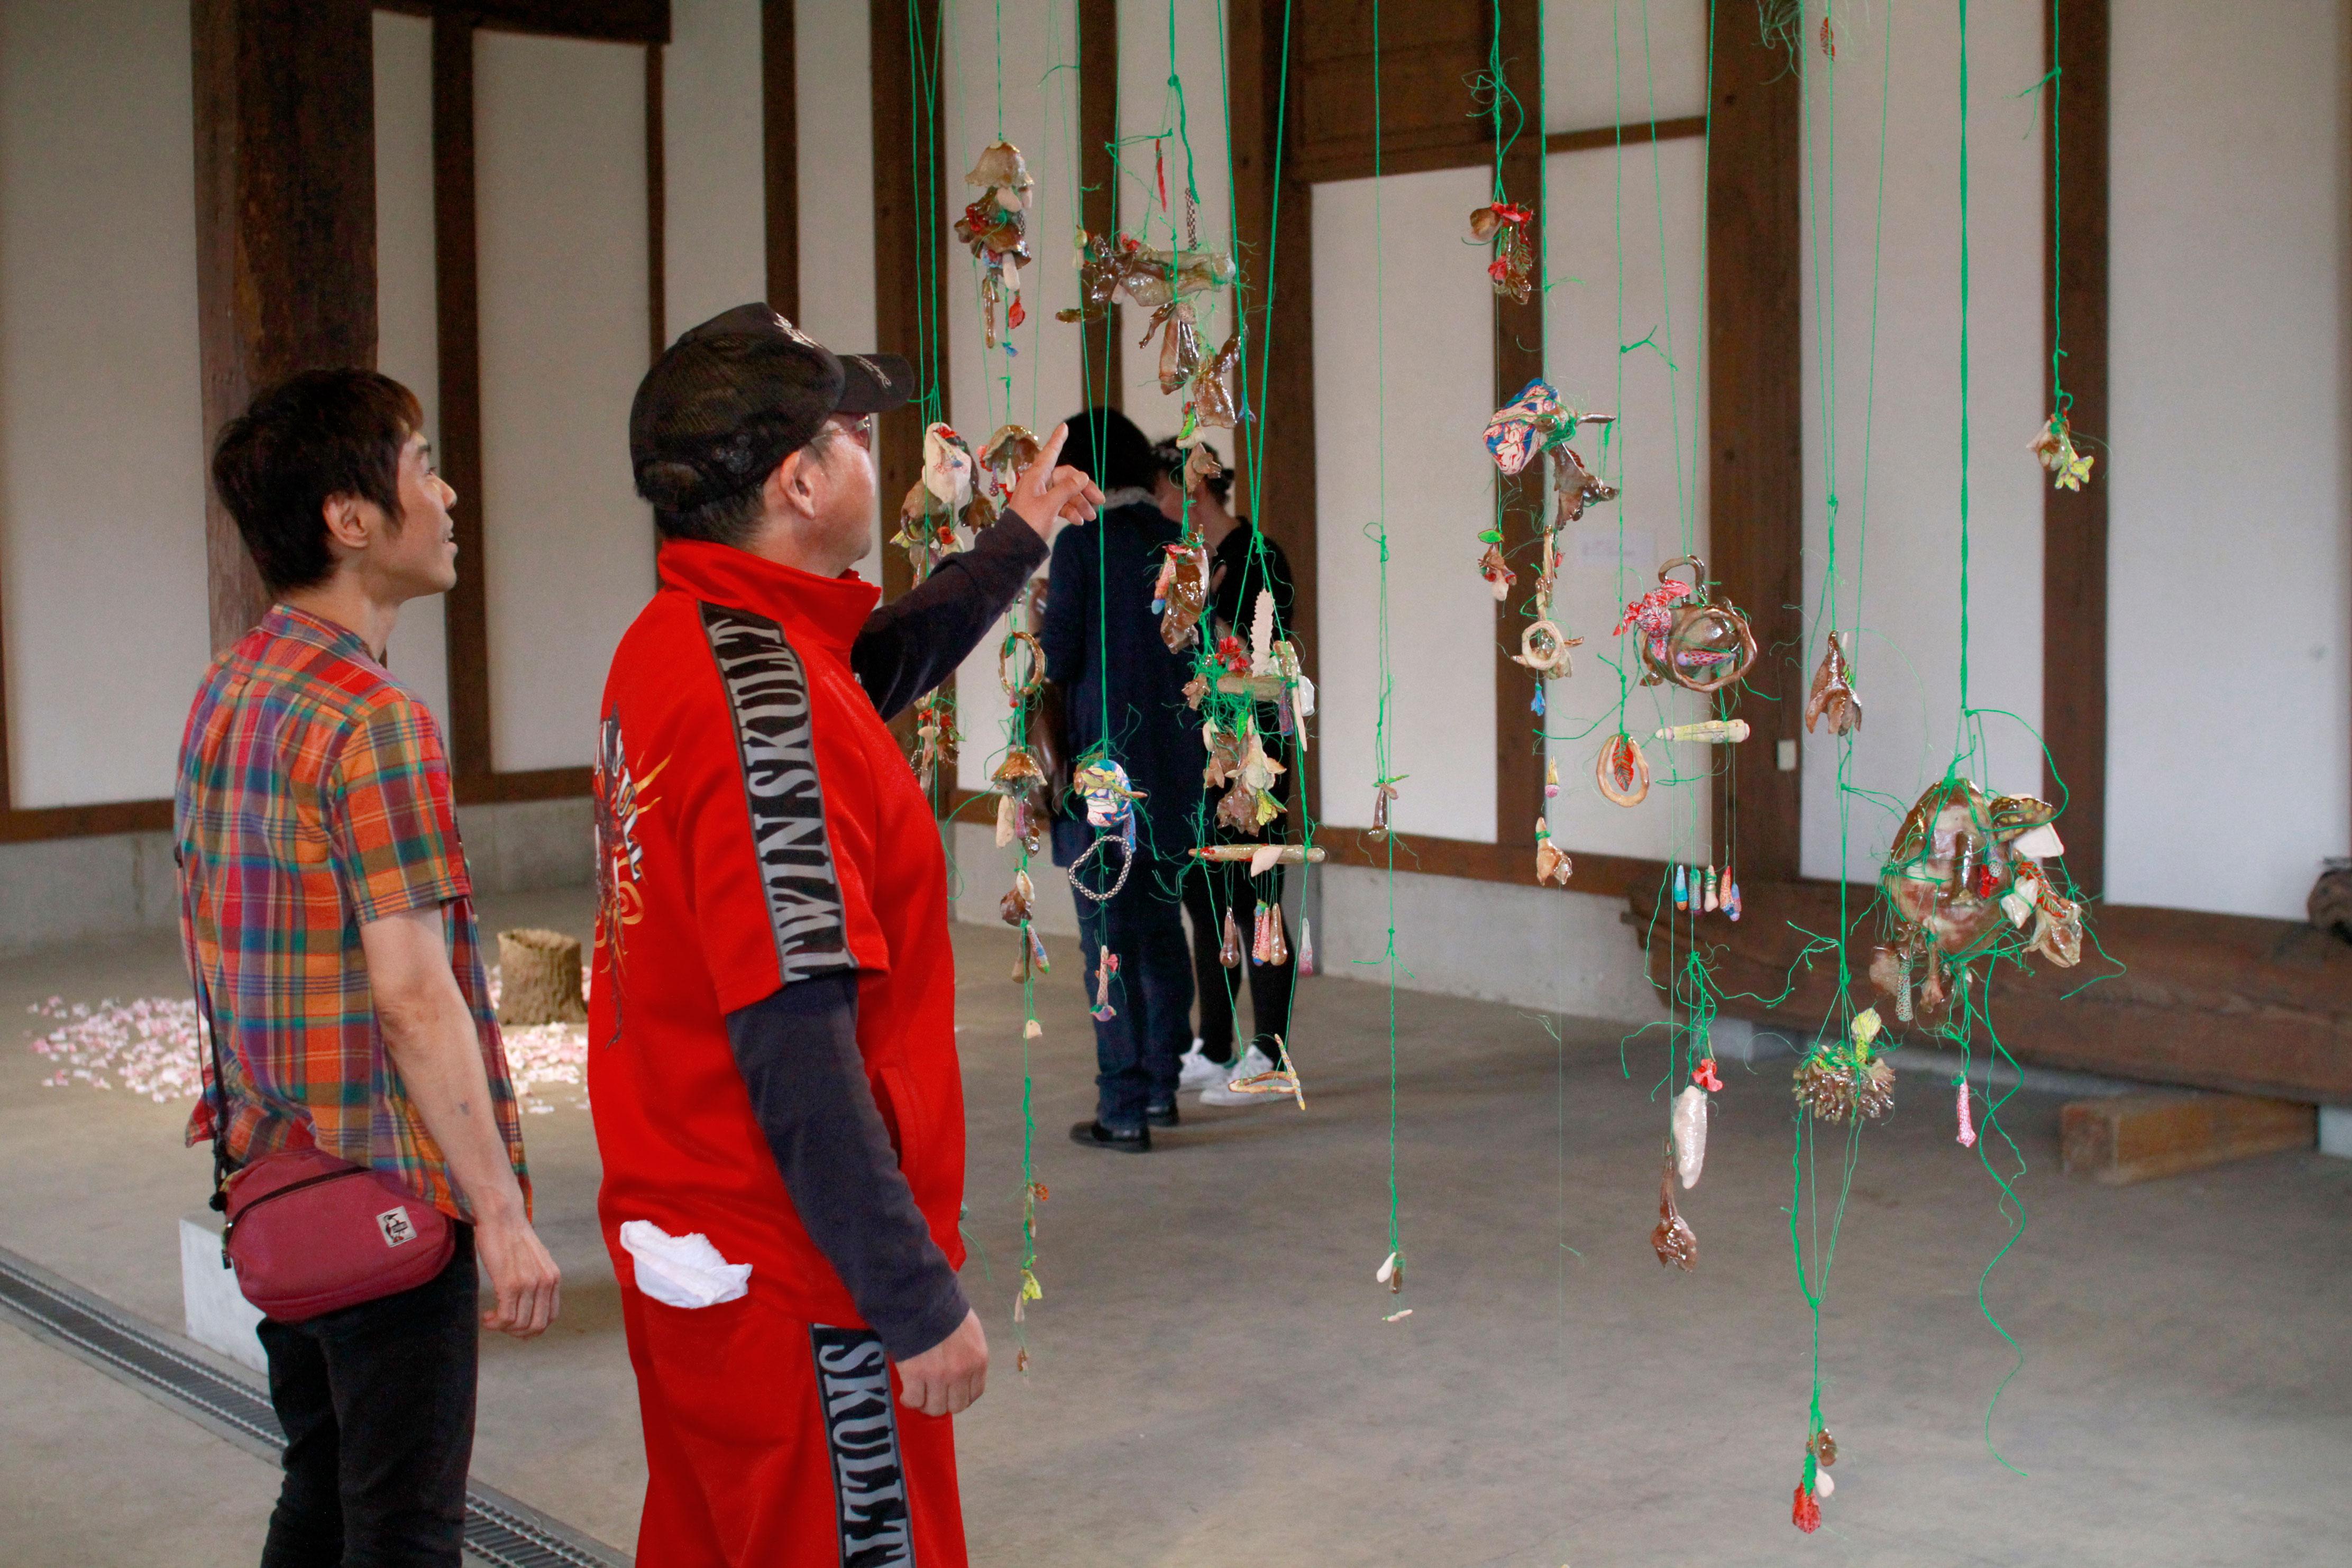 Japan Art Exhibition Shiro Oni Studio Art Residency シロオニスタジオの展覧会 2017 June Josianne